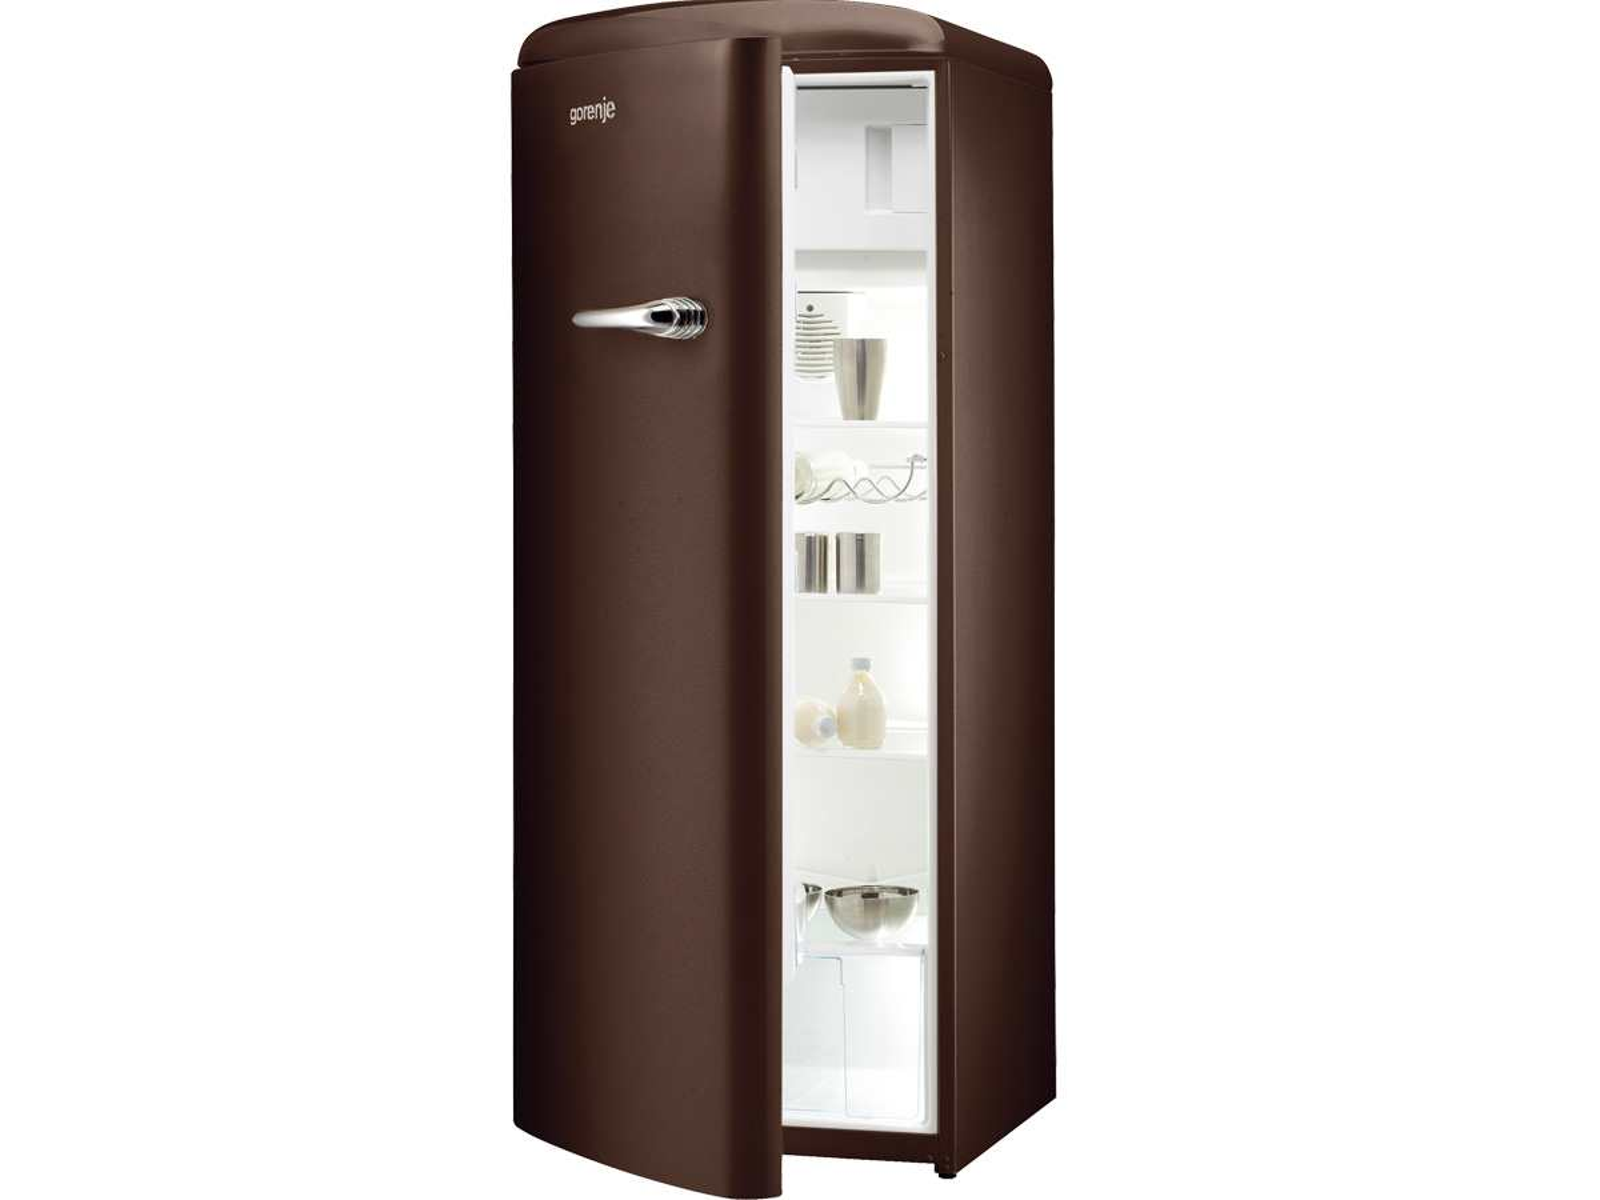 Retro Kühlschrank Notebooksbilliger : Kühlschrank retro gorenje gorenje rk rd kühl gefrier